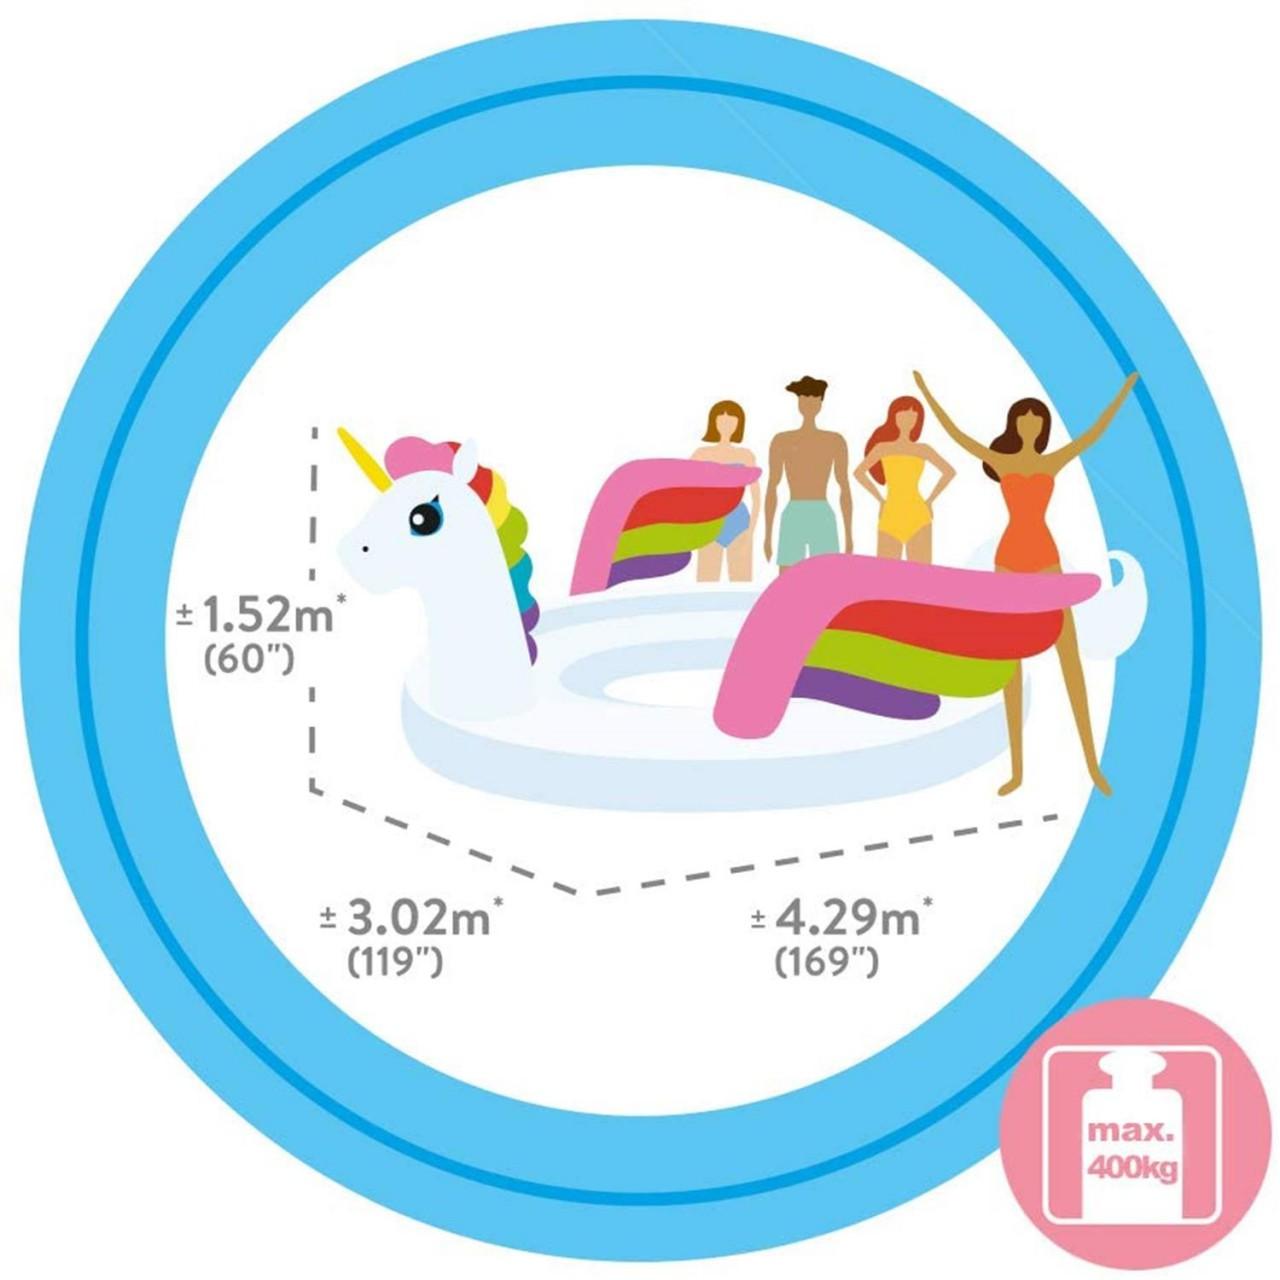 Intex Badeinsel Unicorn Reittier Party Luftmatratze aufblasbar 429x302x152 cm 57296